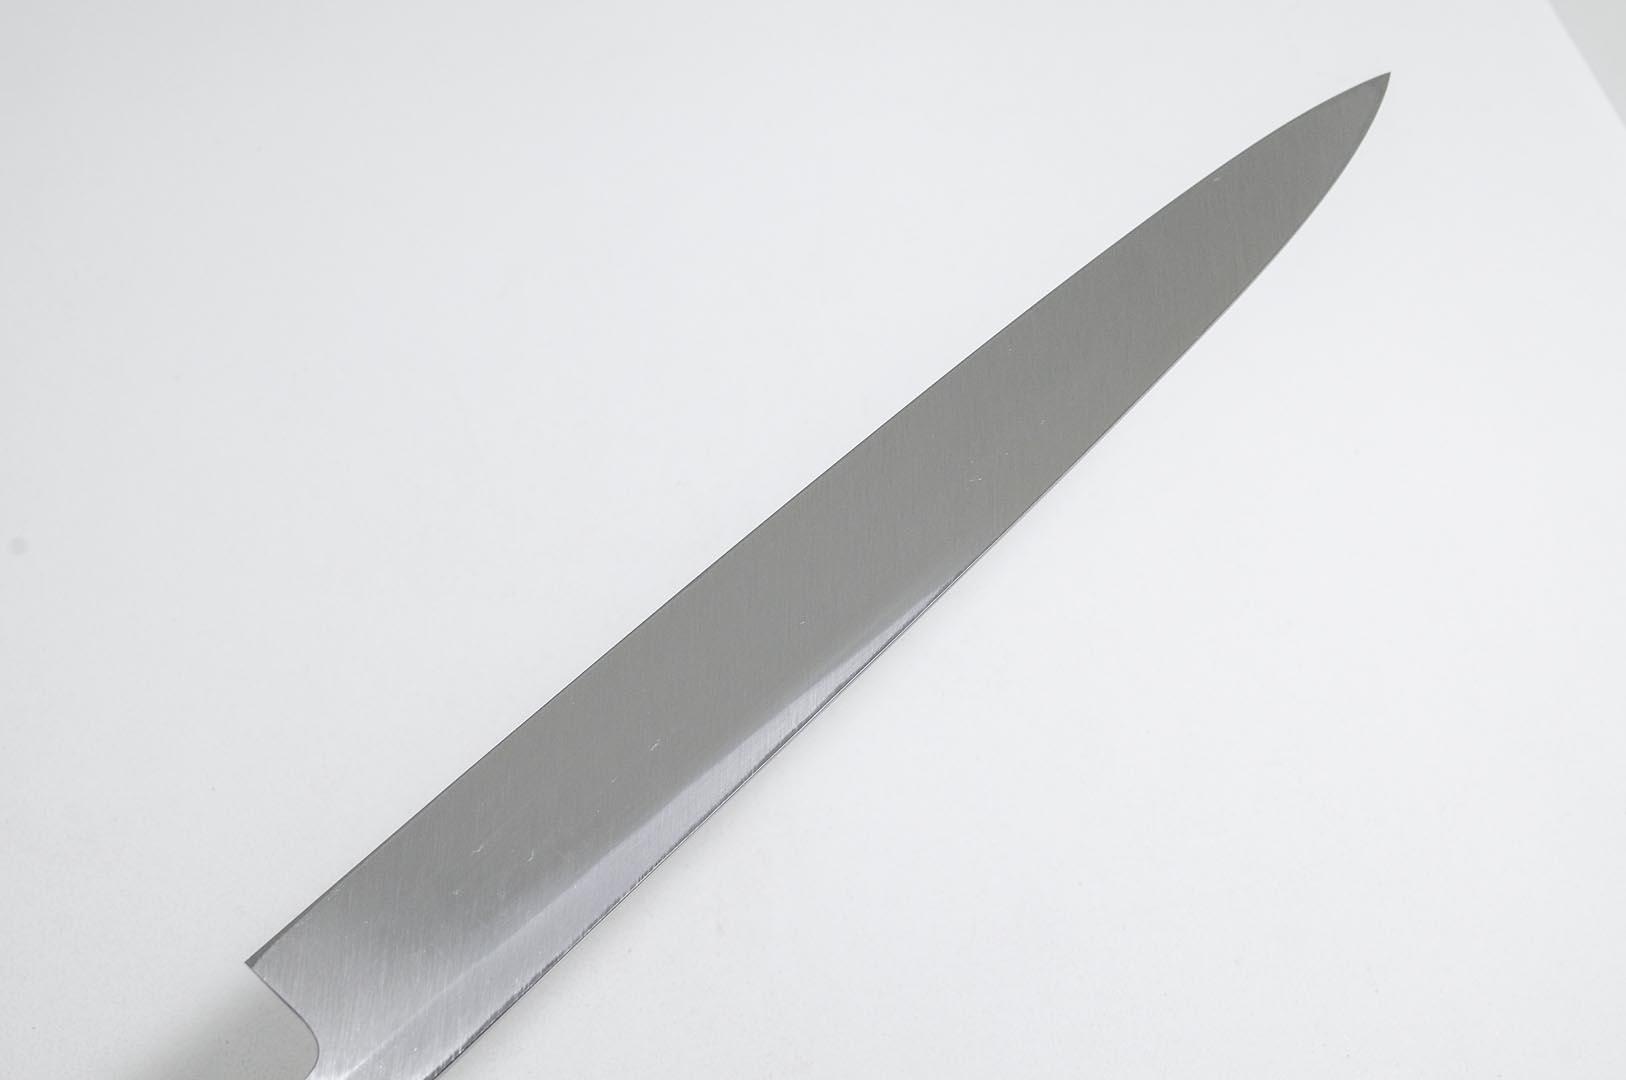 y33w1-Cuchillo Yanagi 33cm acero Shirogami #1 Yoshihiro y33w1-max-5.